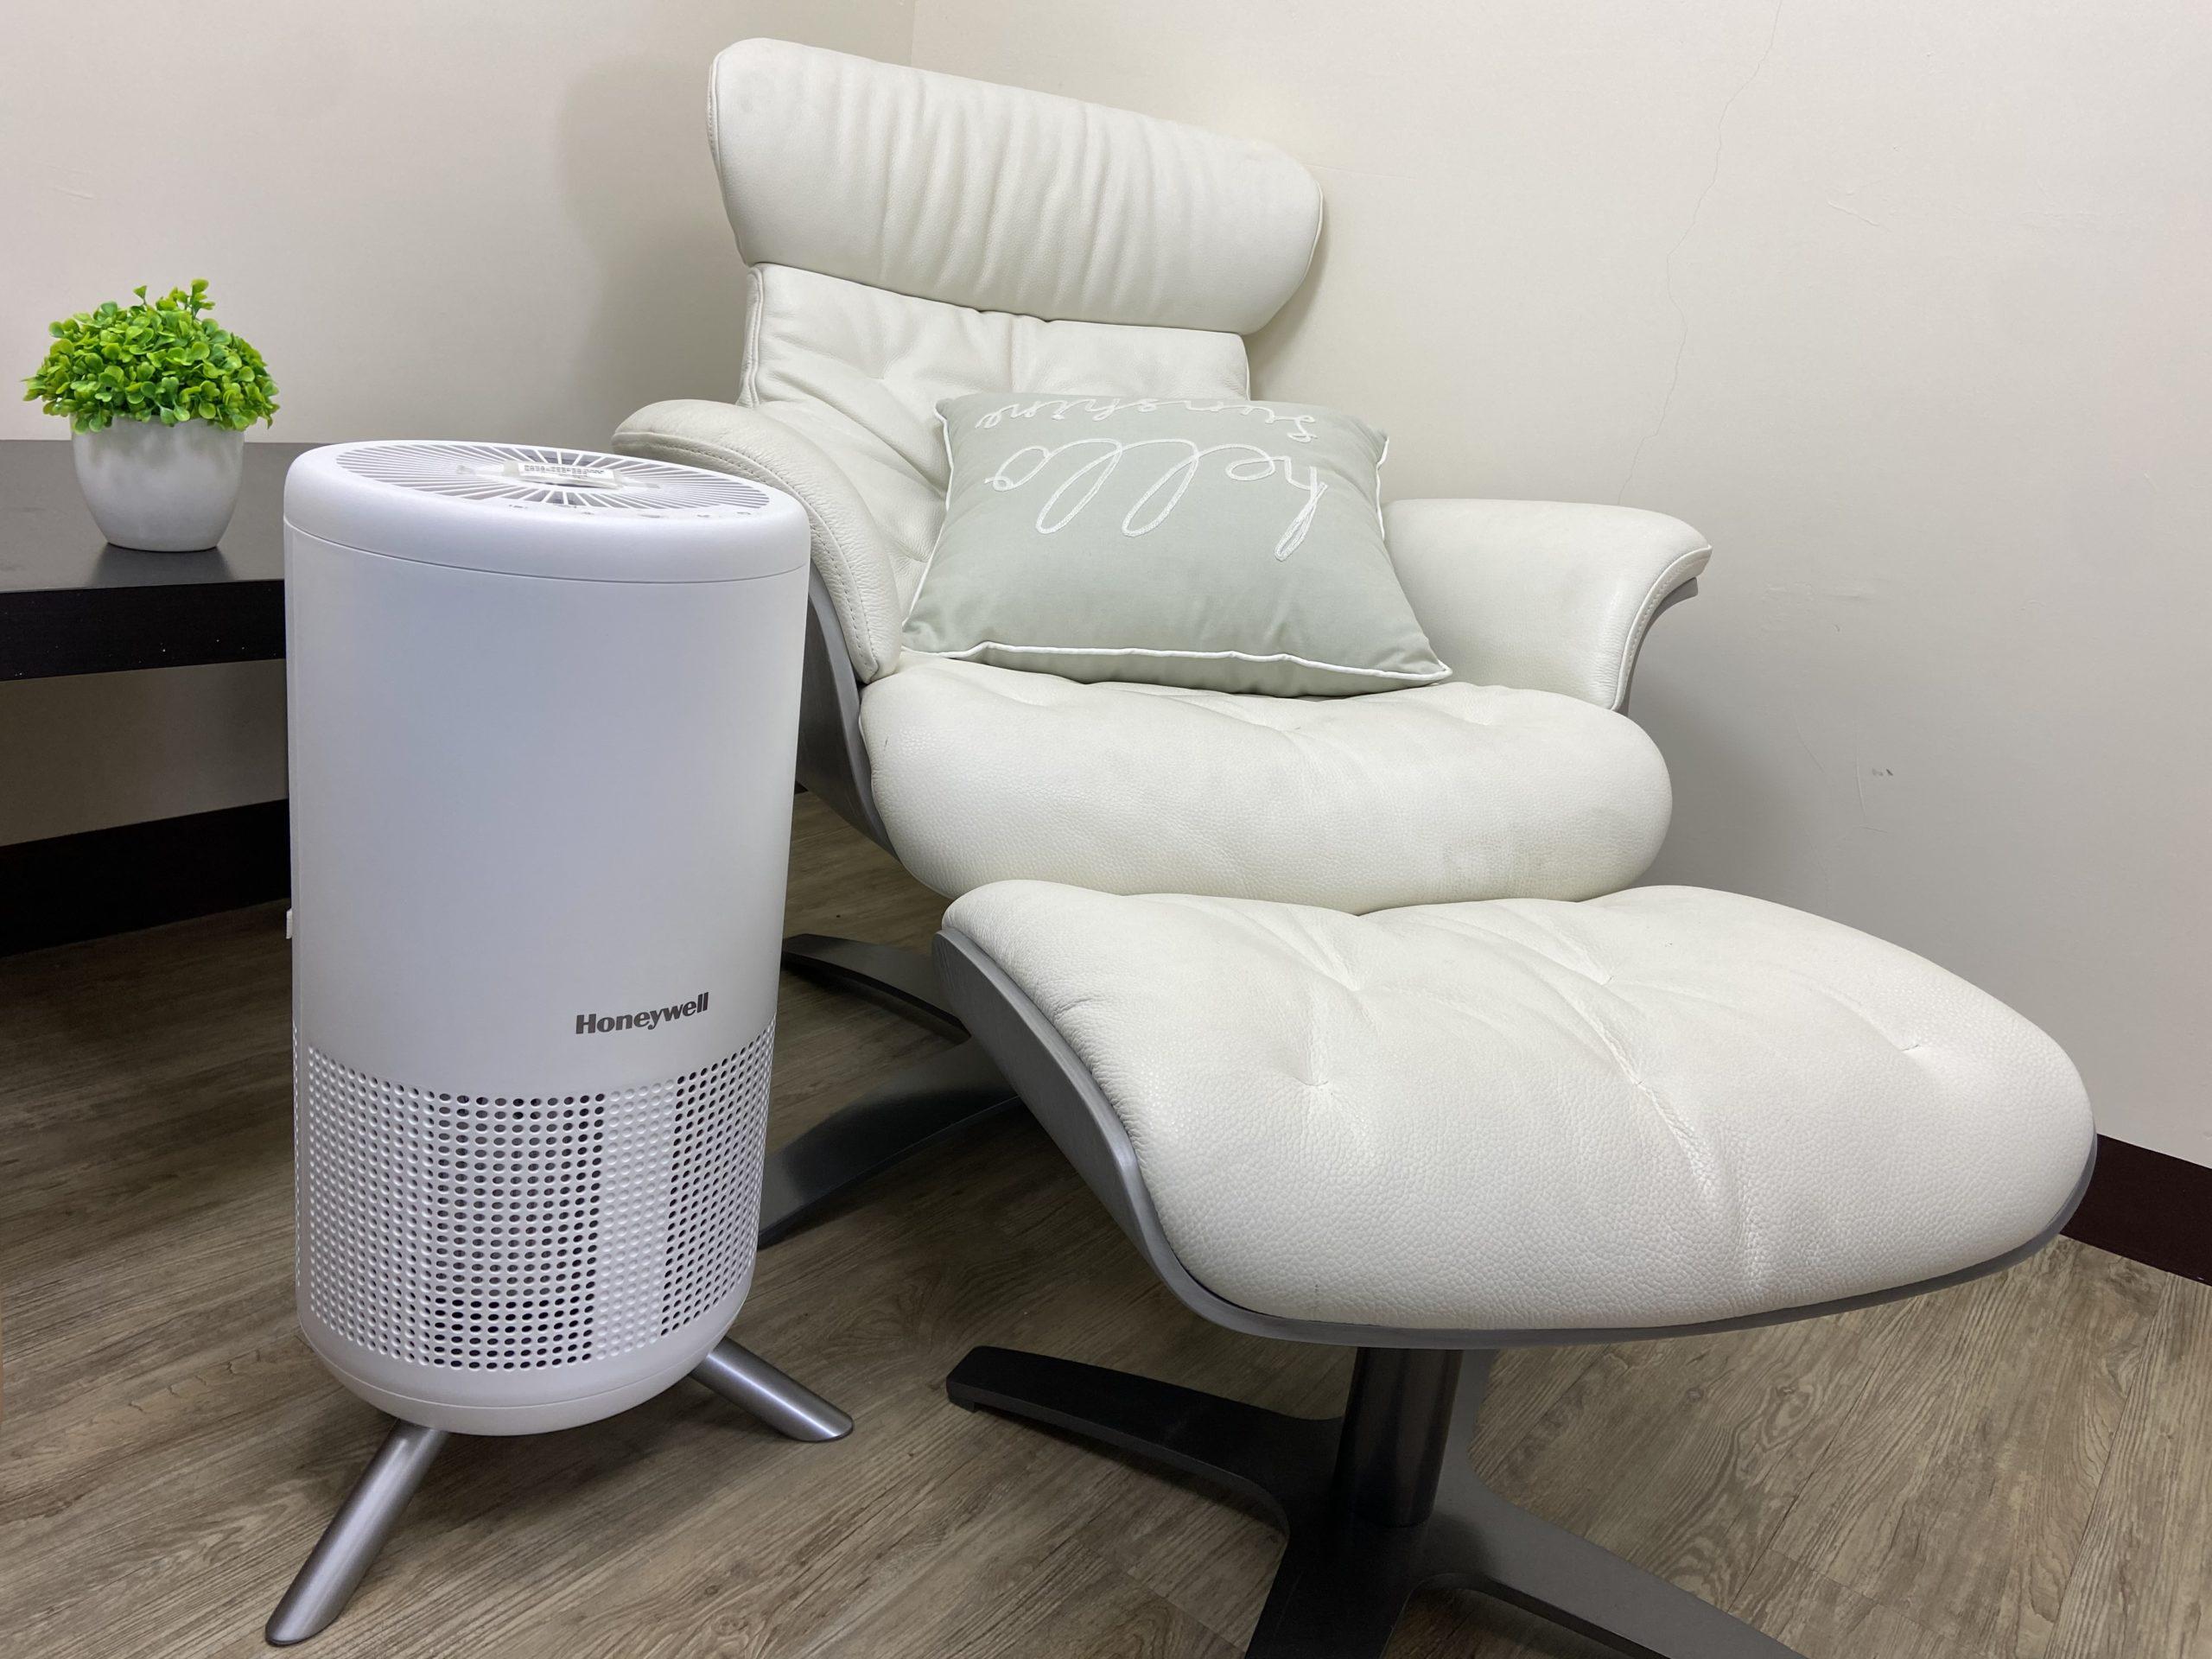 Honeywell HPA 830 淨香氛空氣清淨機 實拍